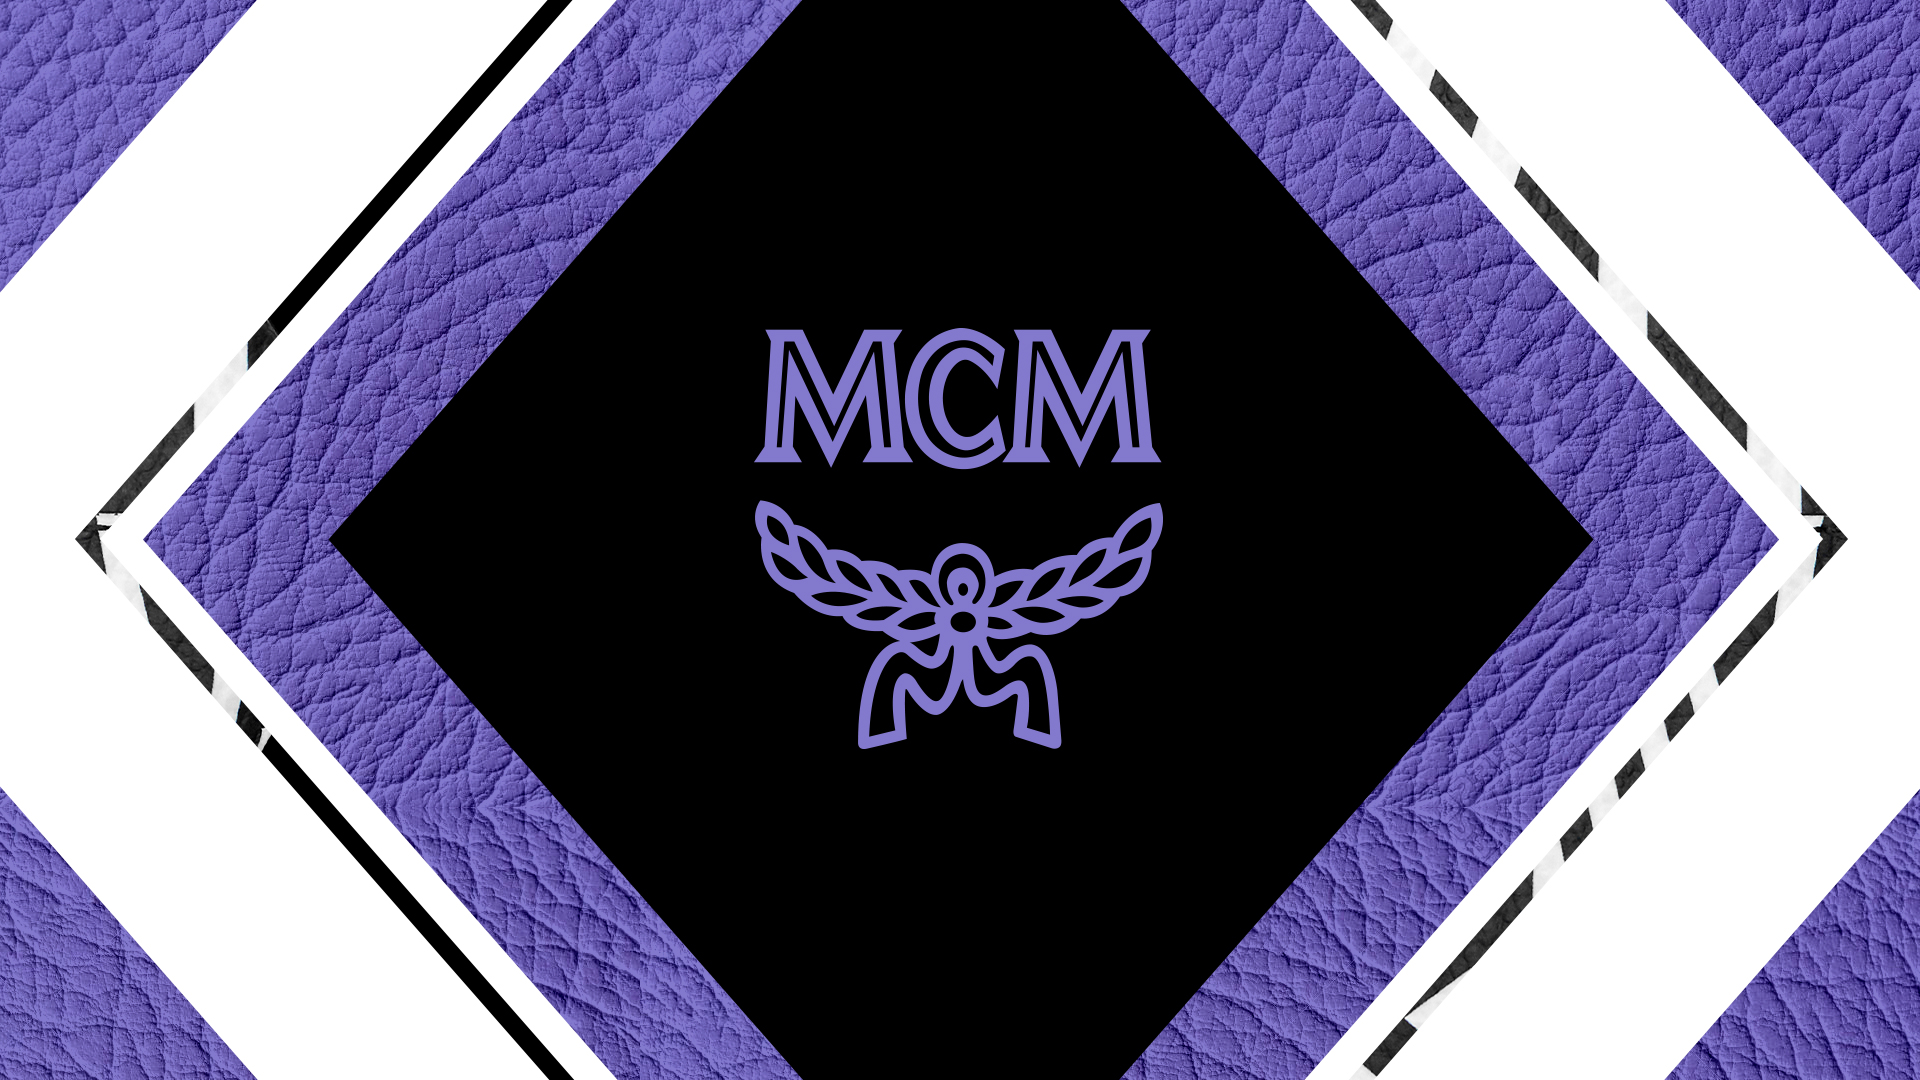 mcm_01